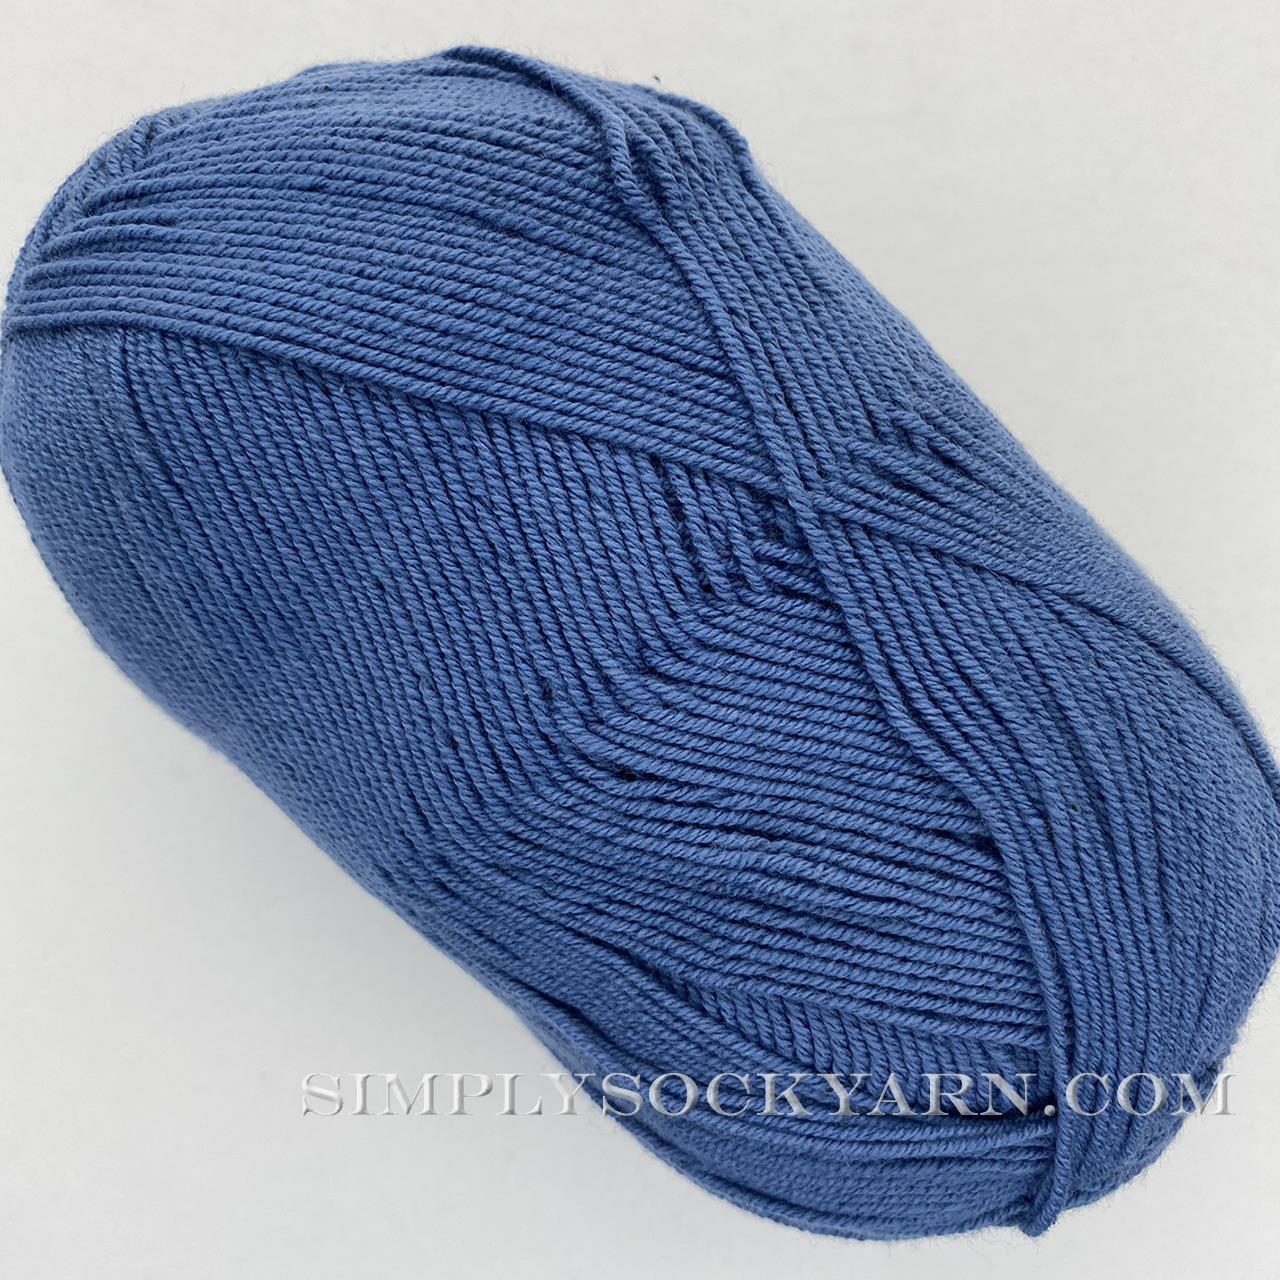 OnLine Supersocke Cotton 2531 -